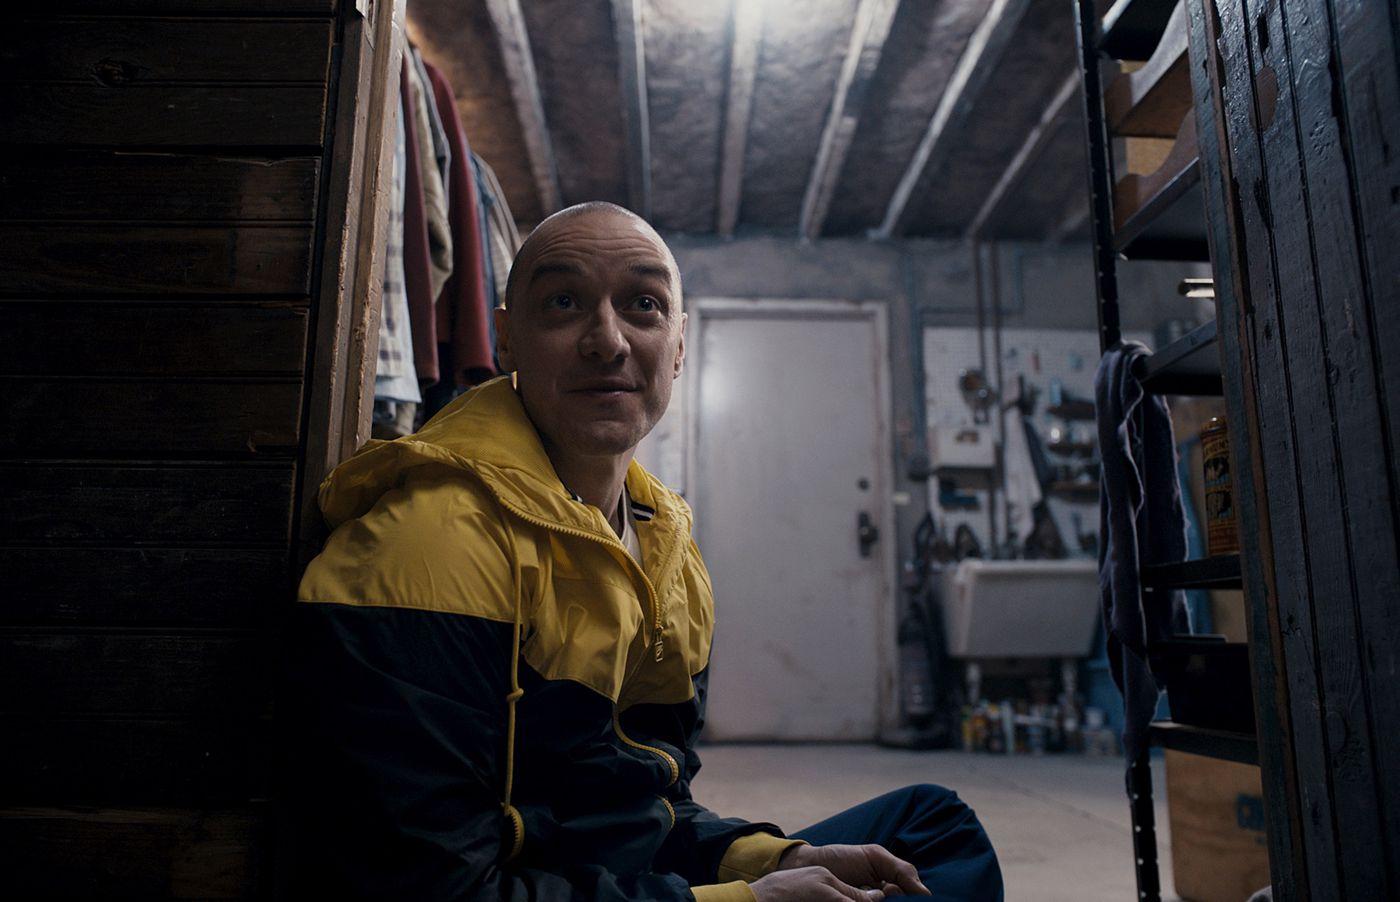 Split is the latest horror film to misunderstand why mental illness